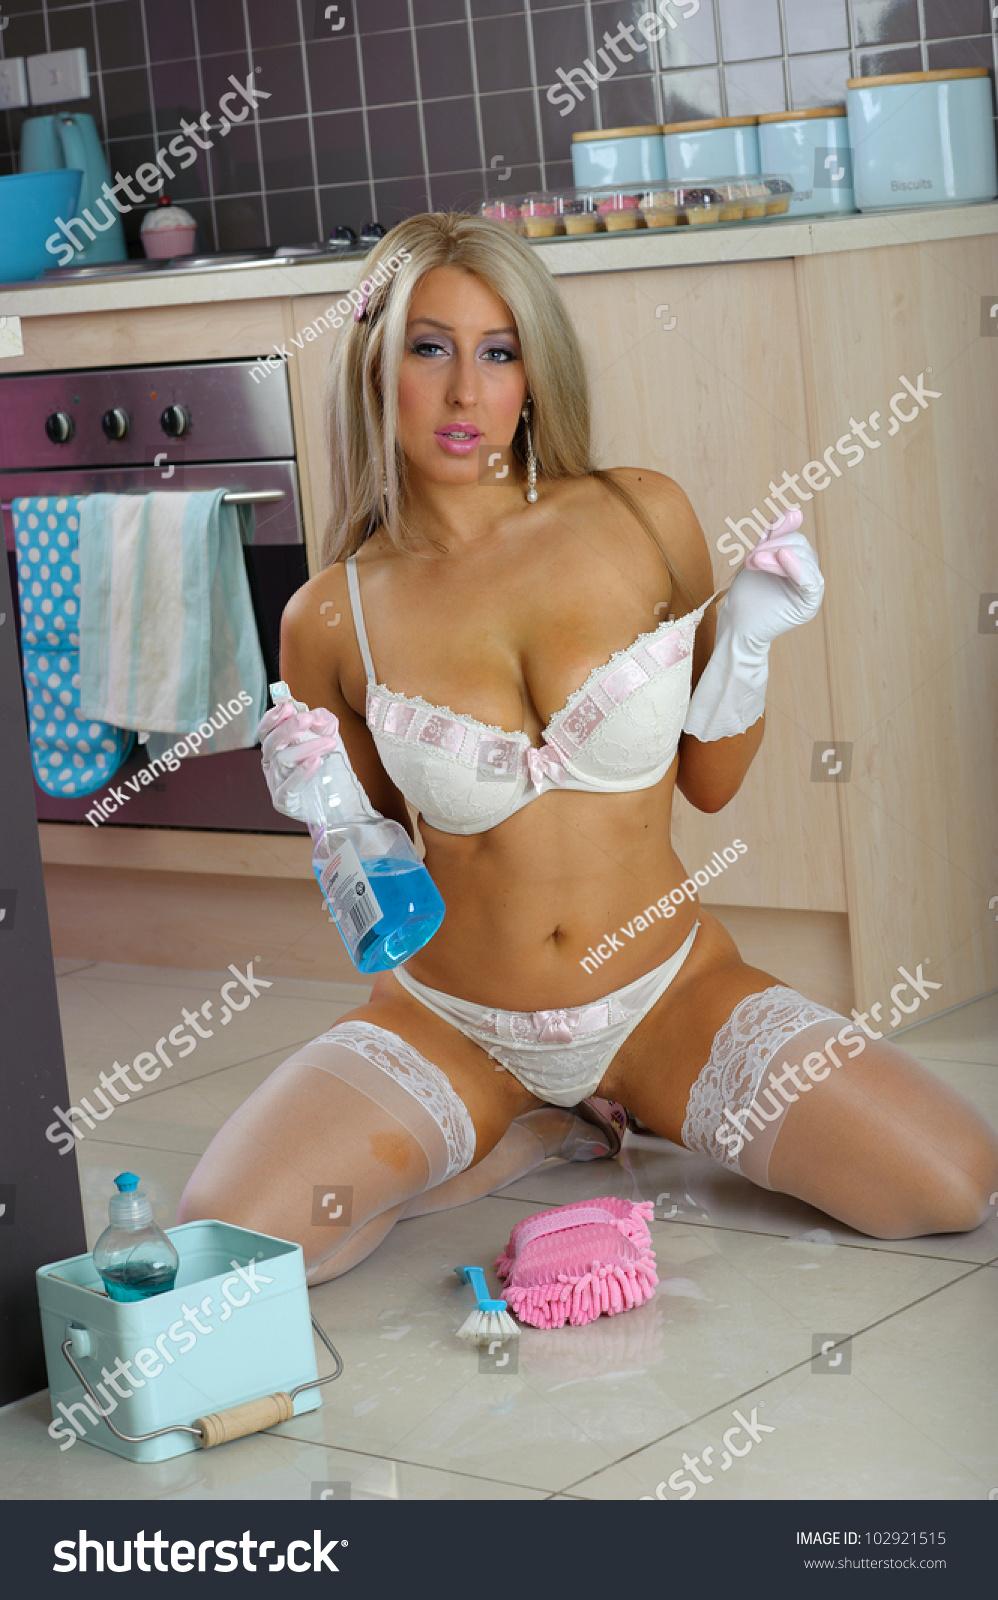 Sexy house cleaner milwaukee